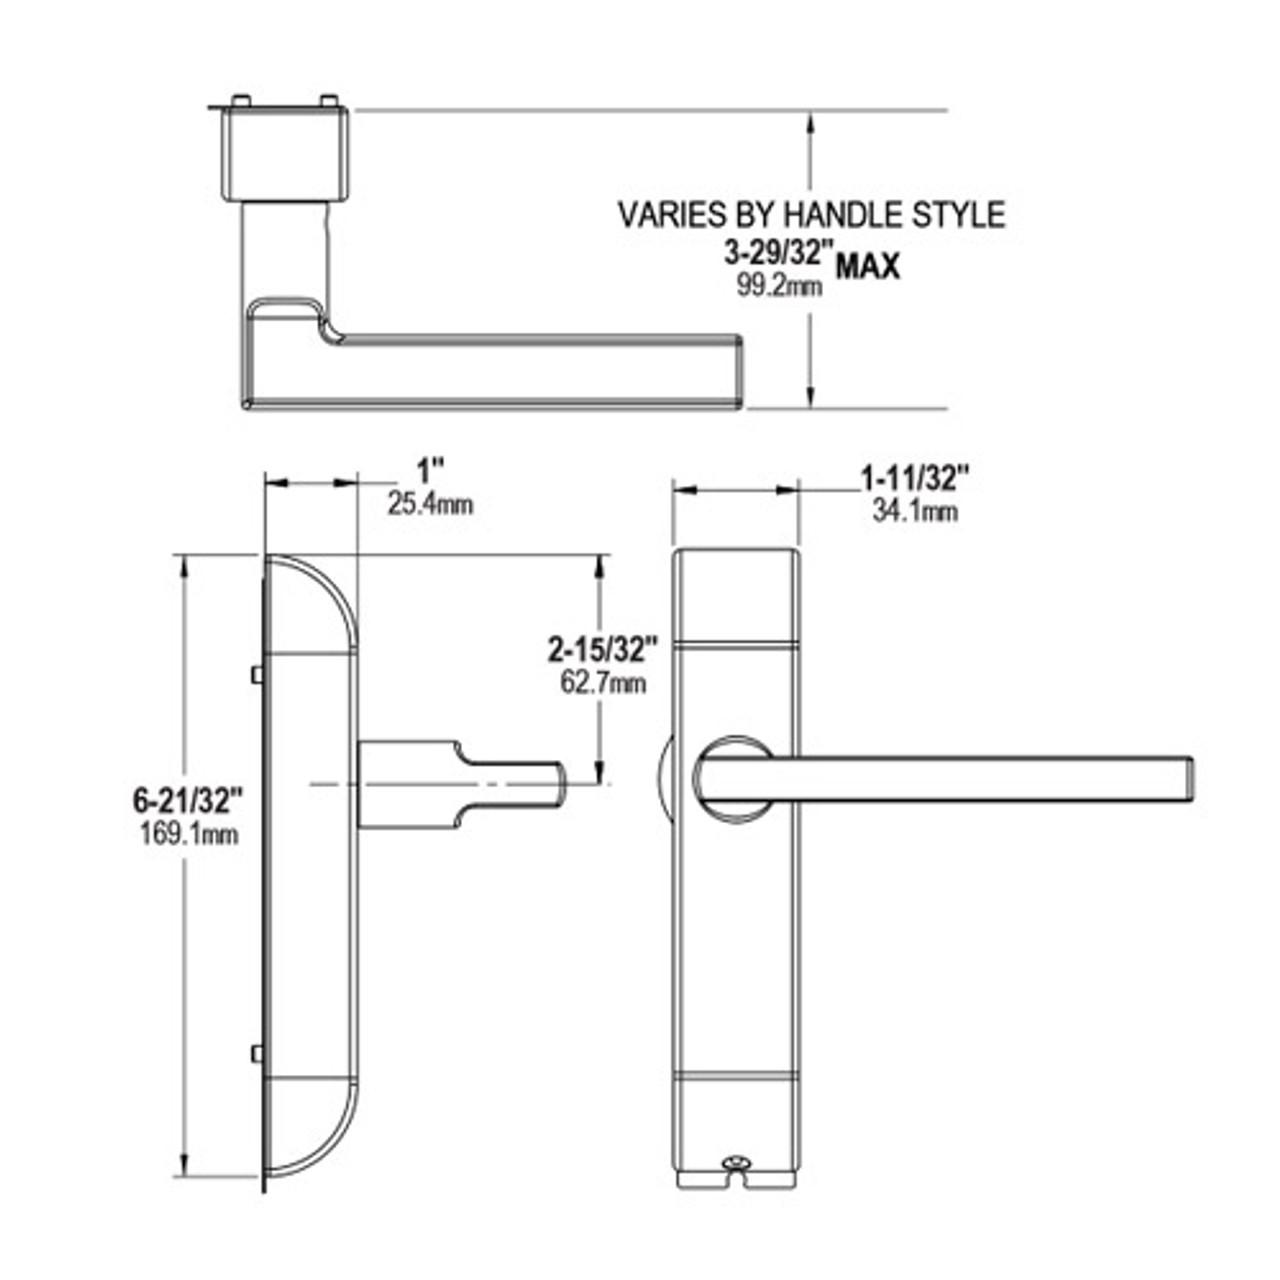 4600M-MW-621-US3 Adams Rite MW Designer handle Dimensional View